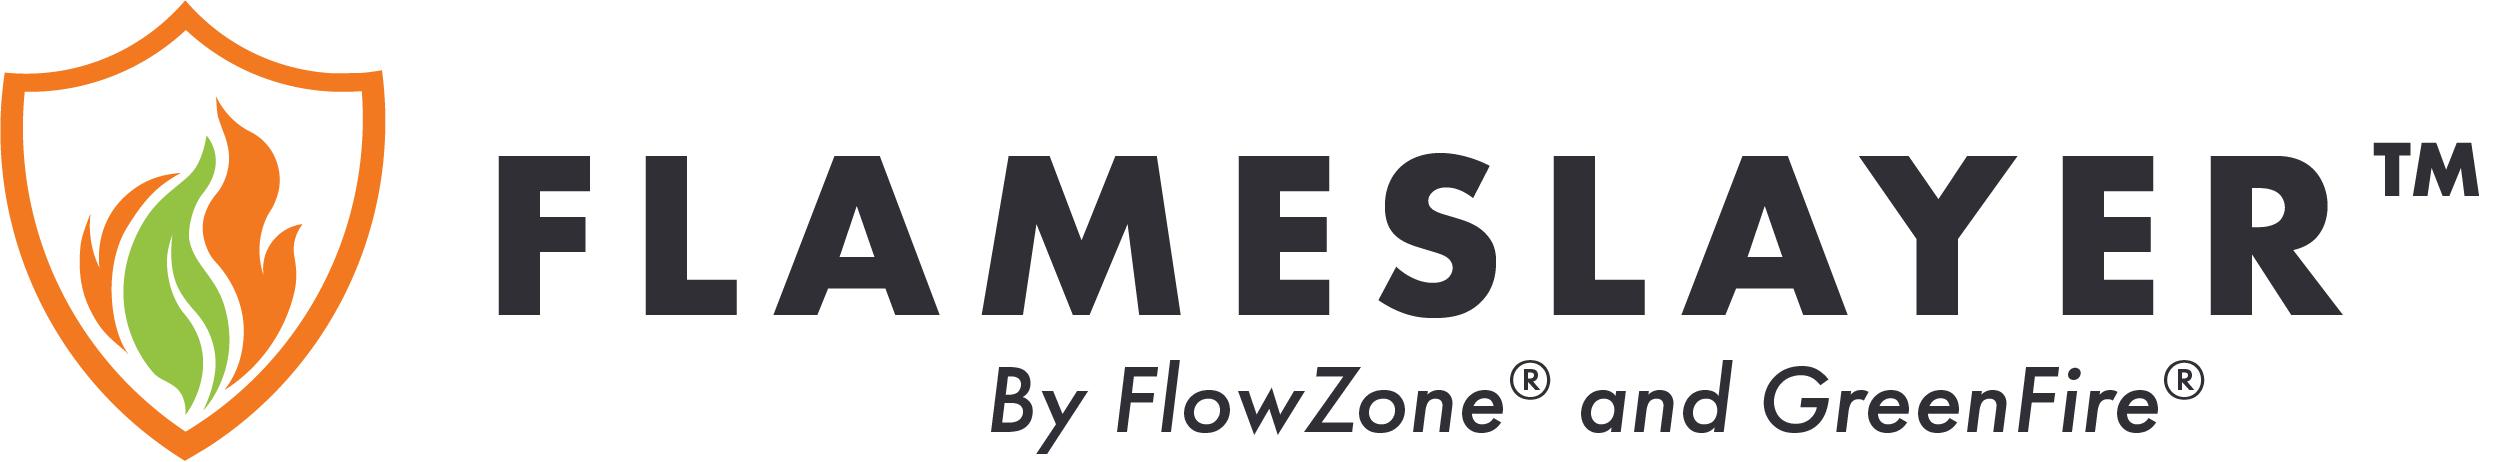 FlameSlayer logo